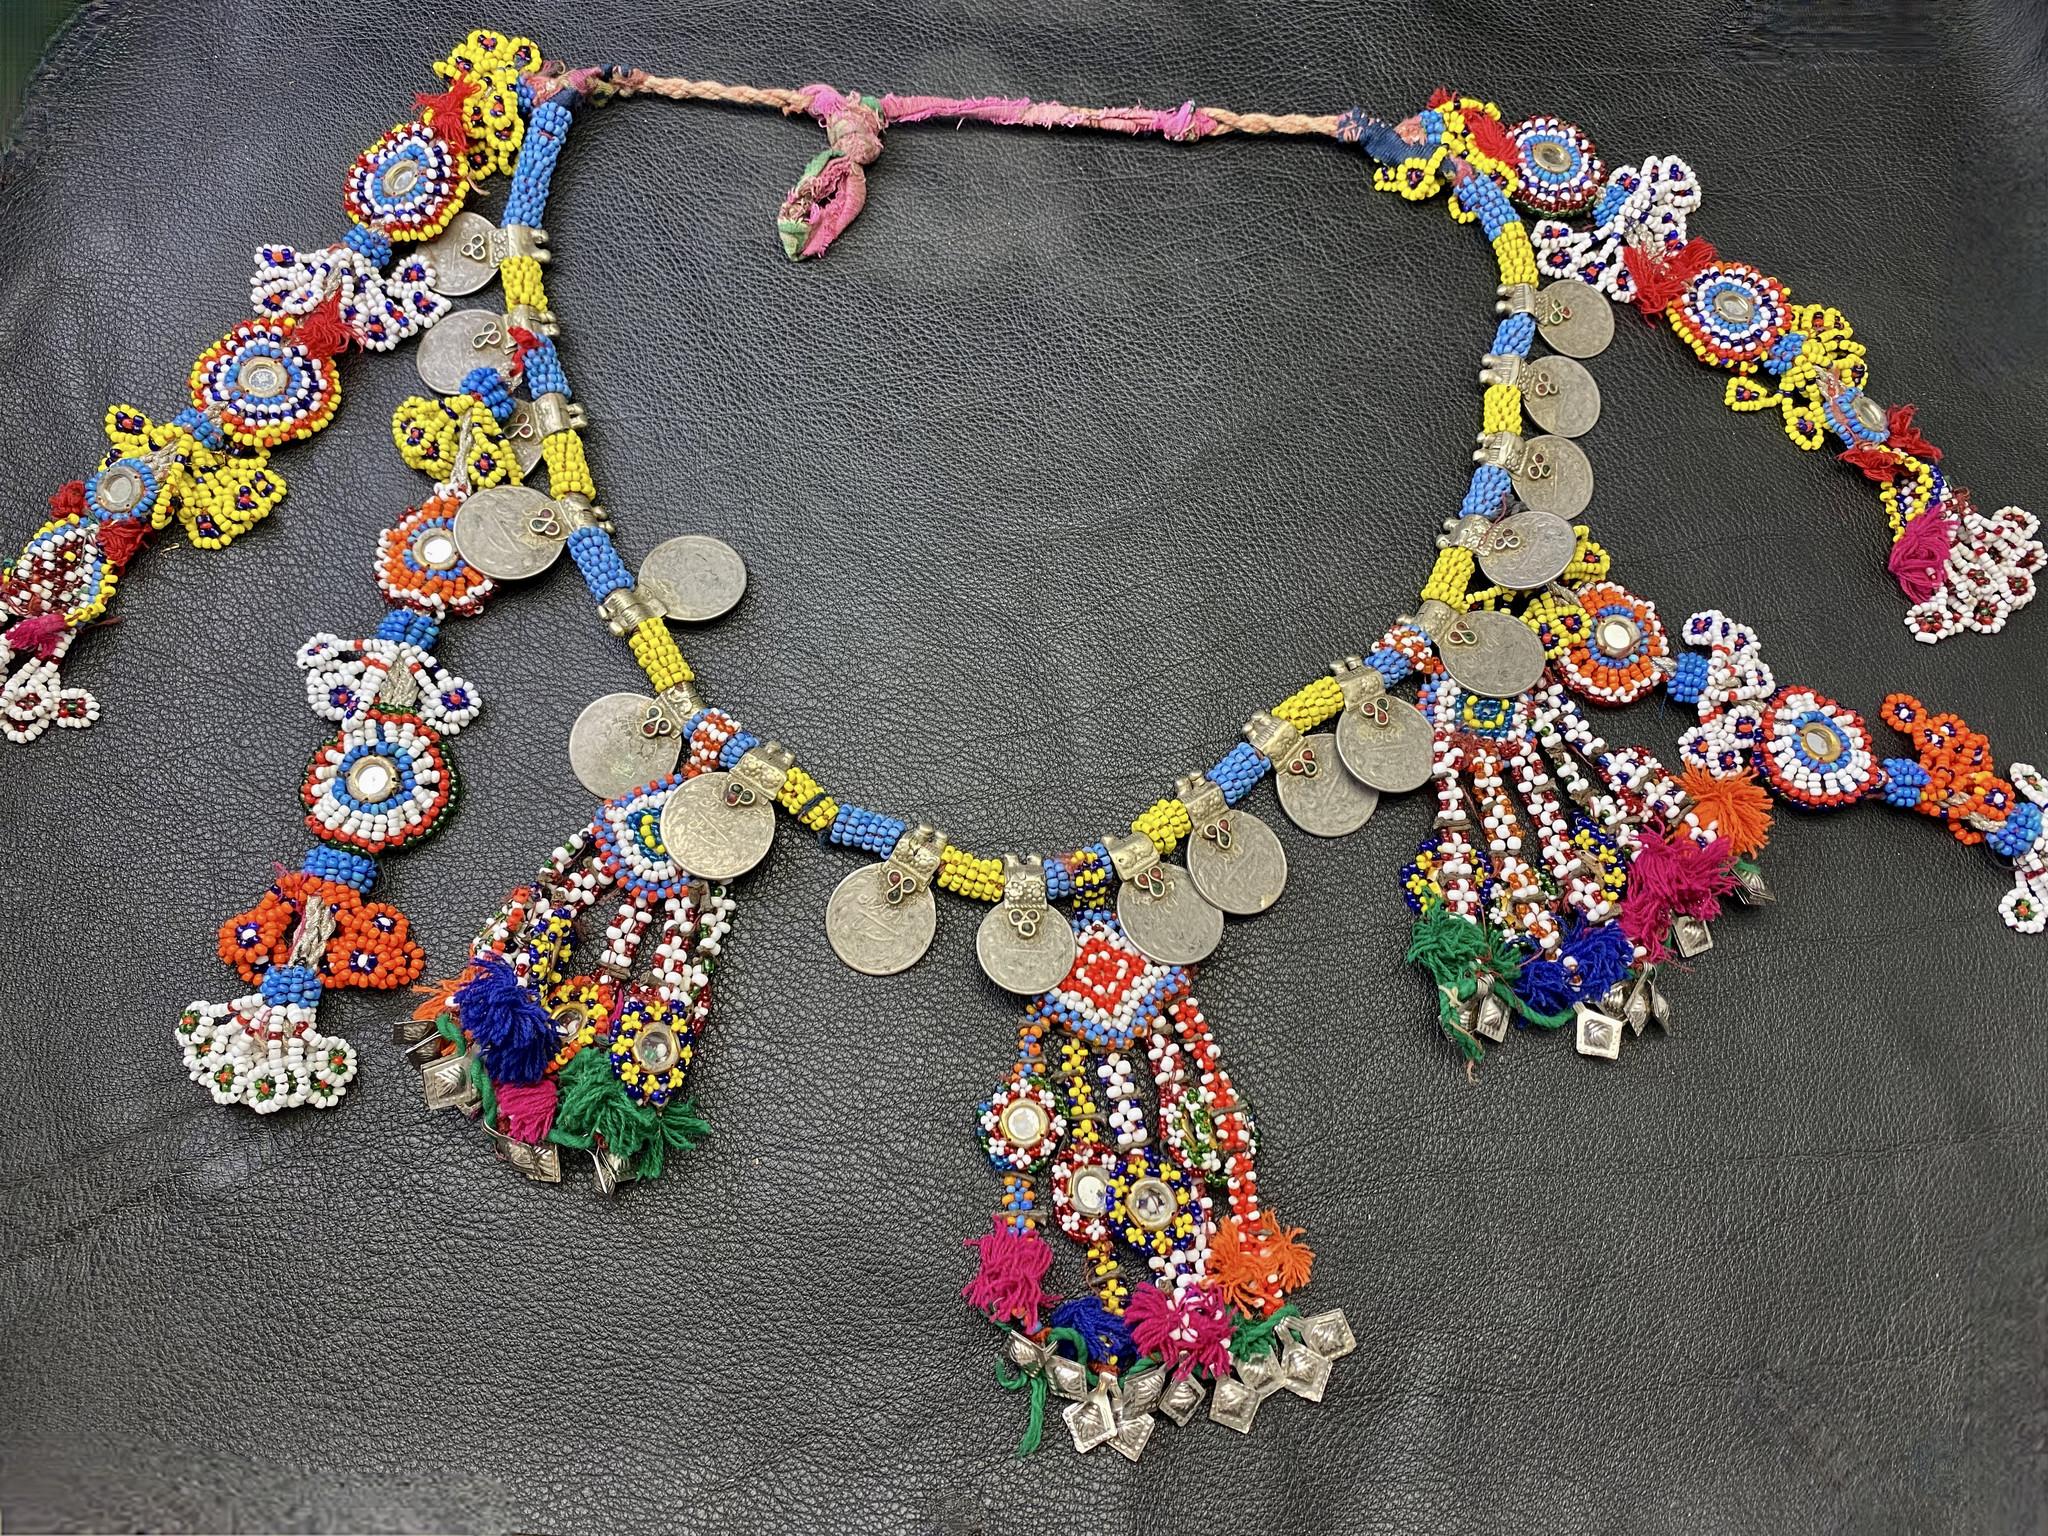 Tribalbelt / Tribal necklace